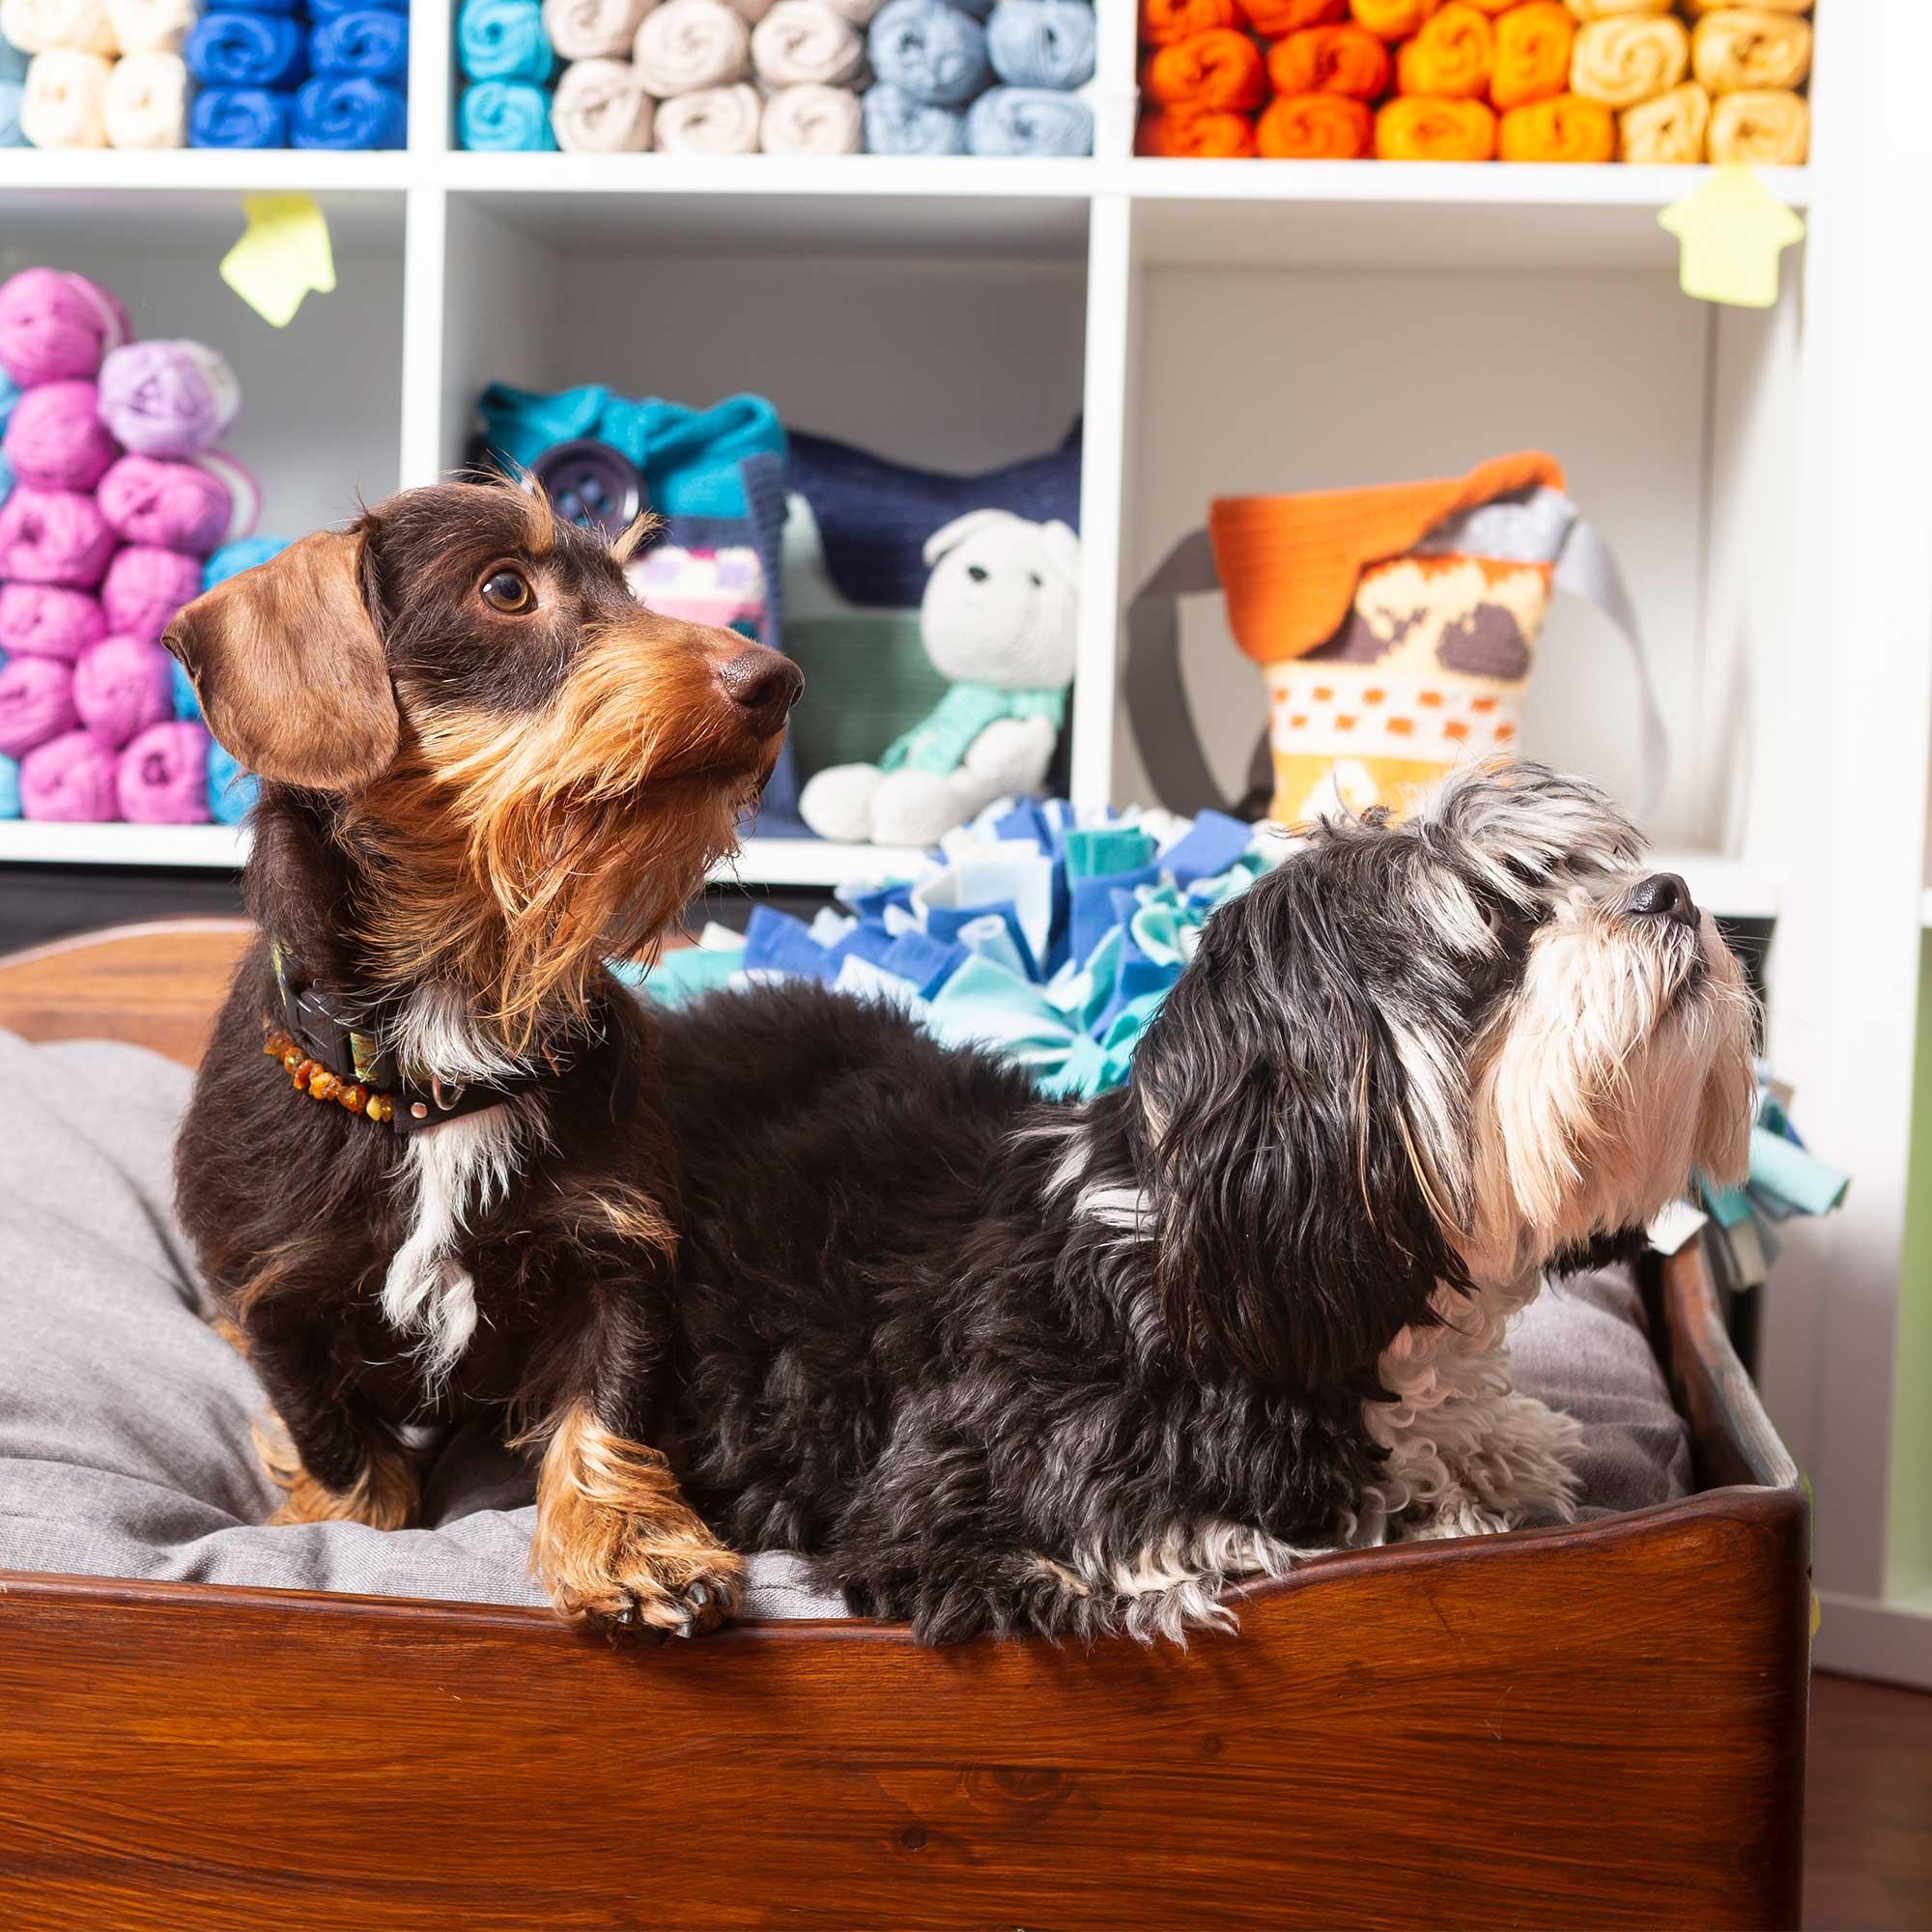 Meine Luzy mit Rauhaardackel-Kunpel Cap im Hundebett